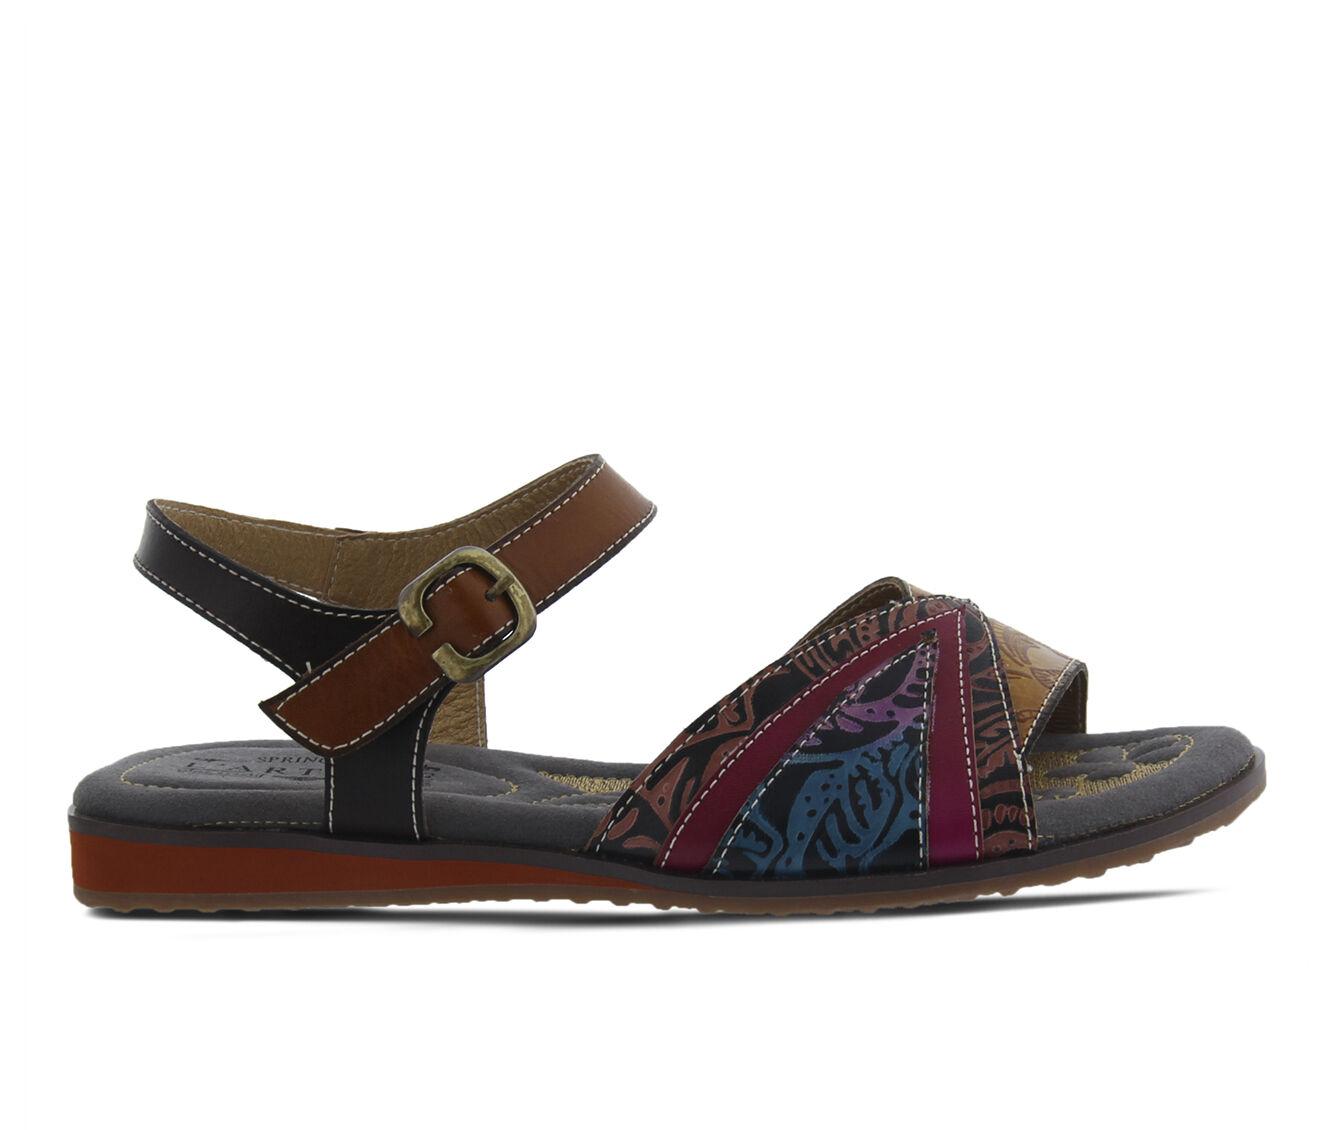 purchase cheap new Women's L'ARTISTE Goldenite Sandals Camel Multi